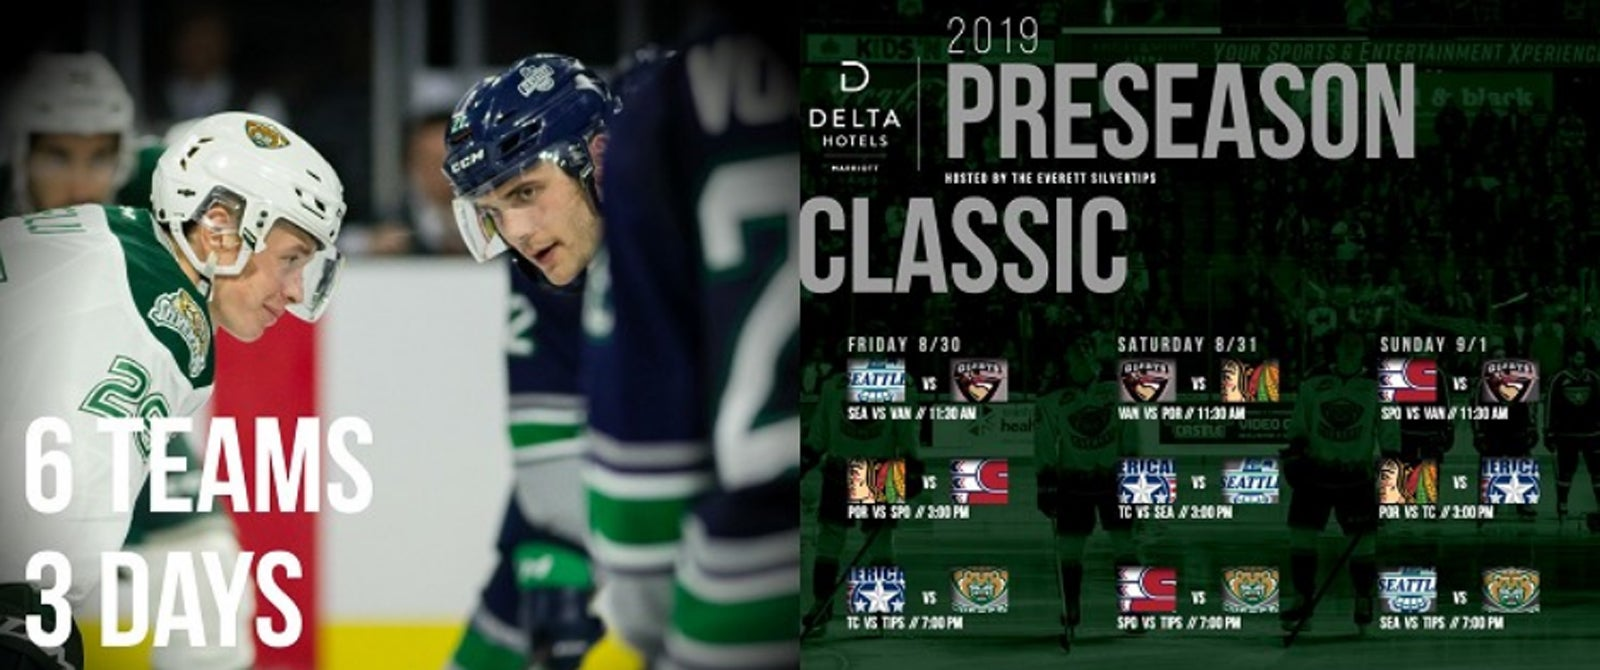 2019 Preseason Classic